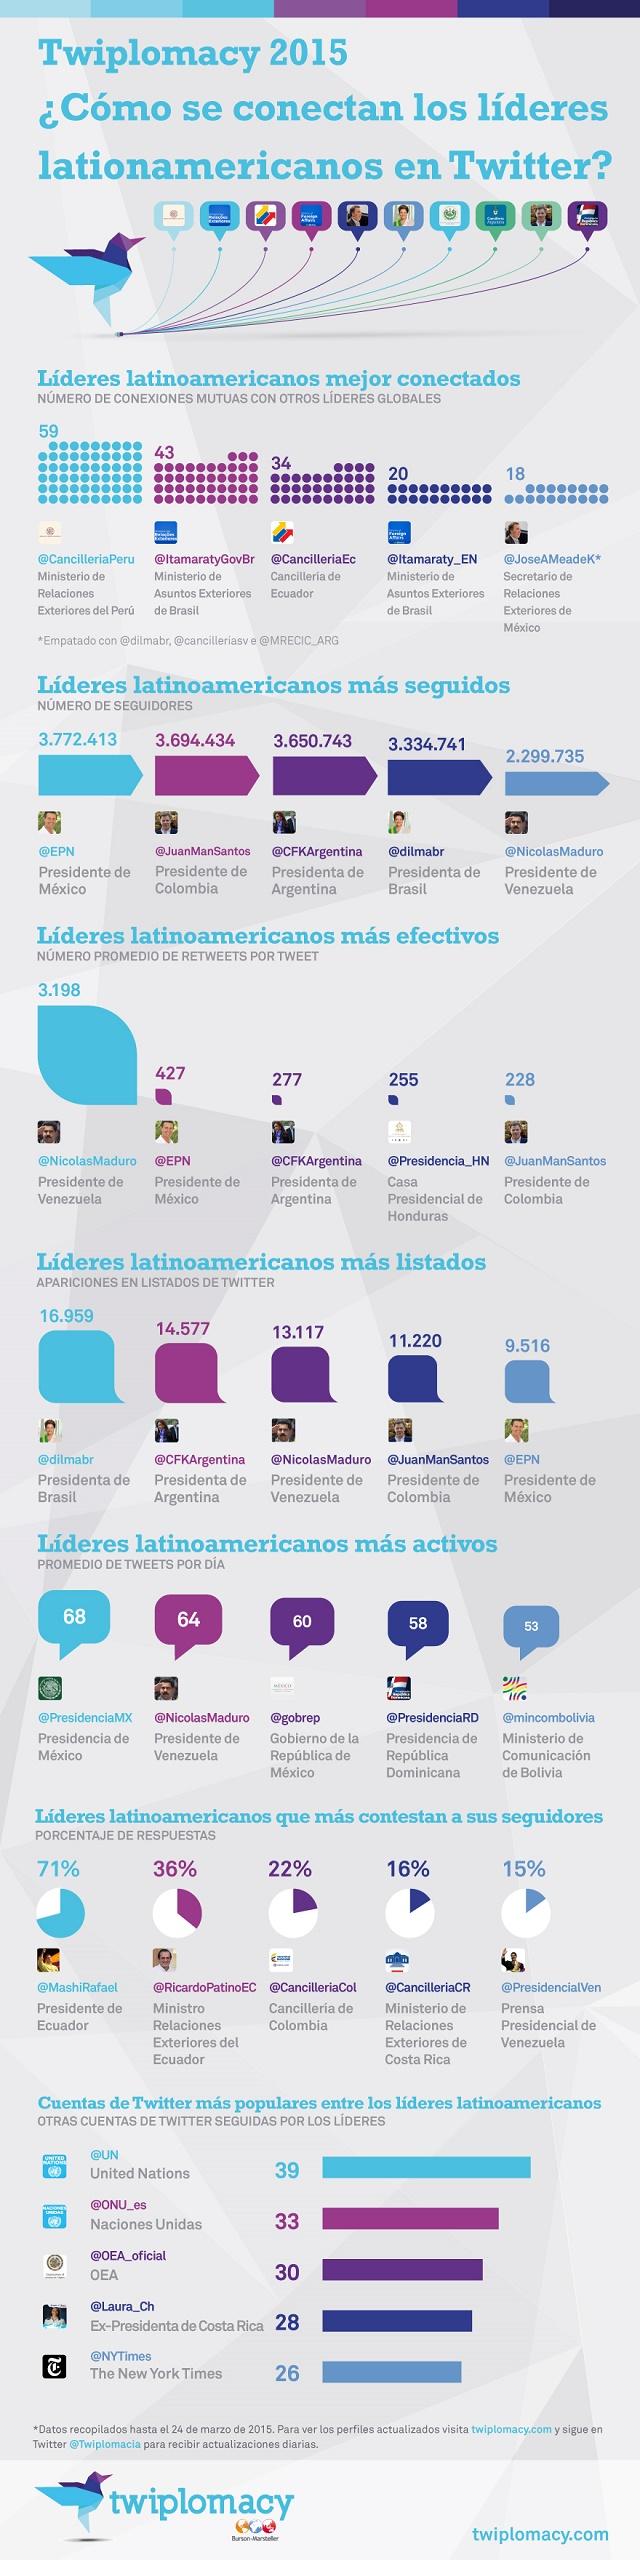 Twiplomacy_2015_Infographic_LatAm_Spanish